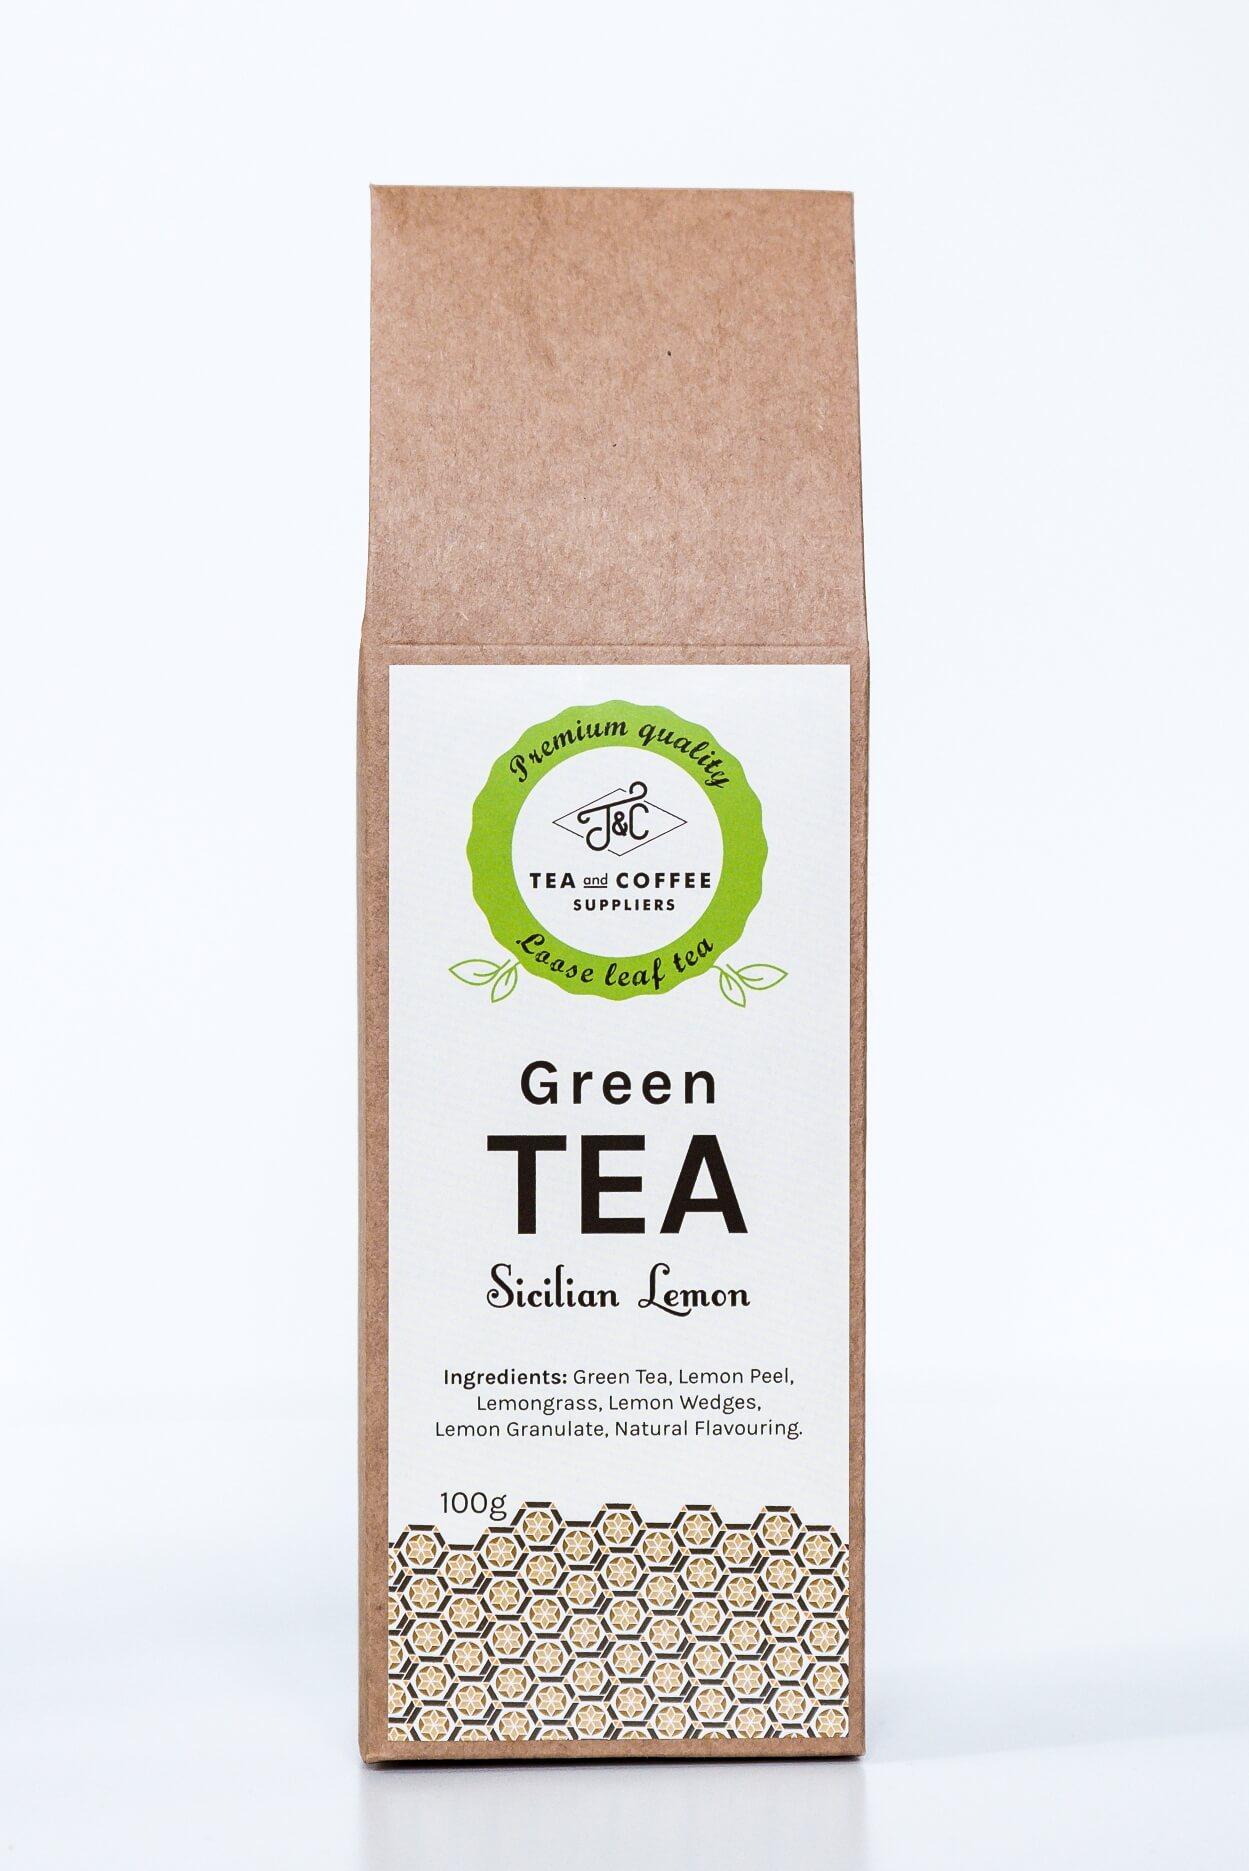 T&C Green Tea Sicilian Lemon